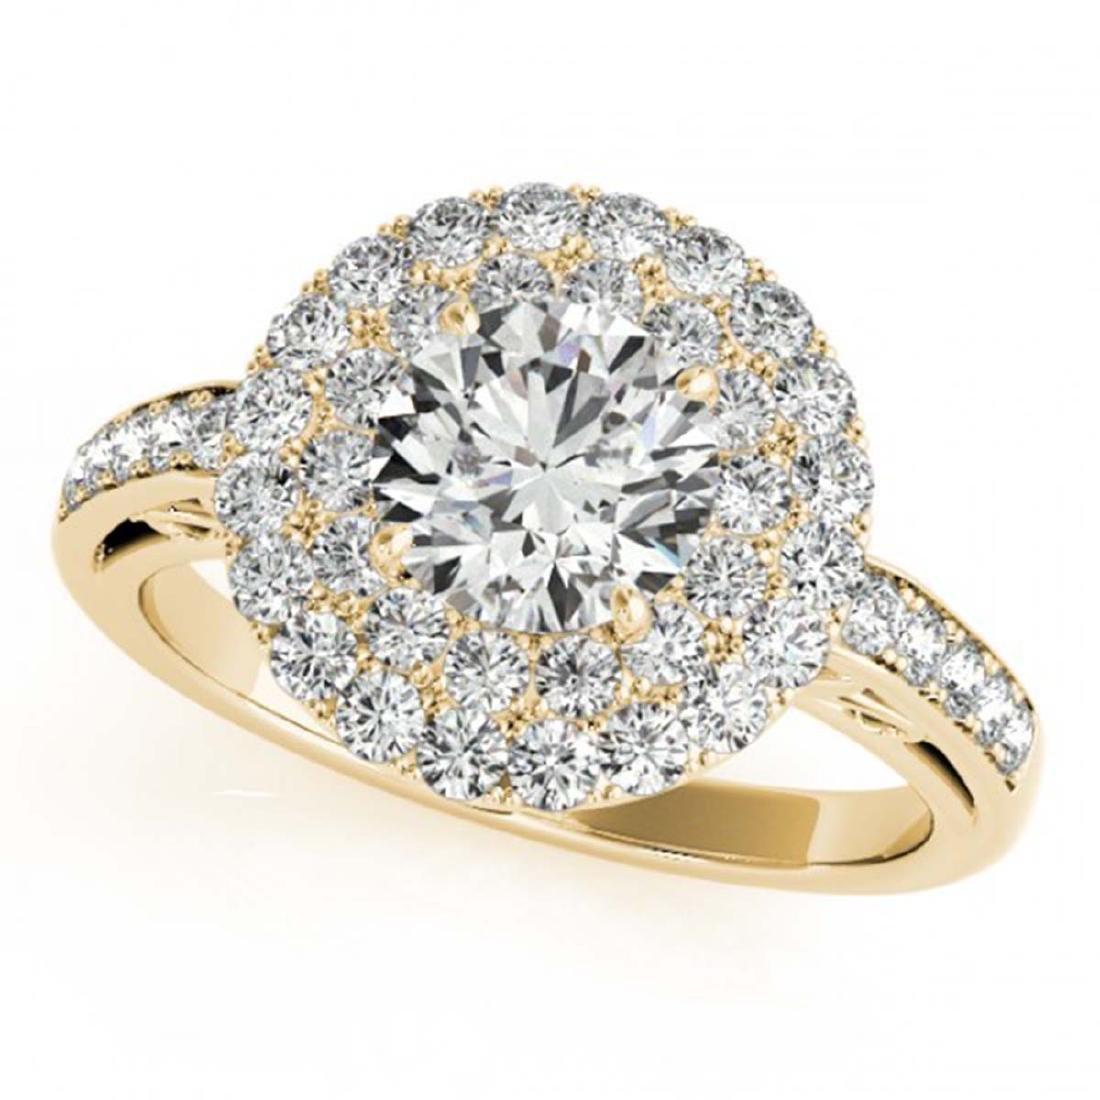 2.25 ctw VS/SI Diamond Halo Ring 18K Yellow Gold - - 2